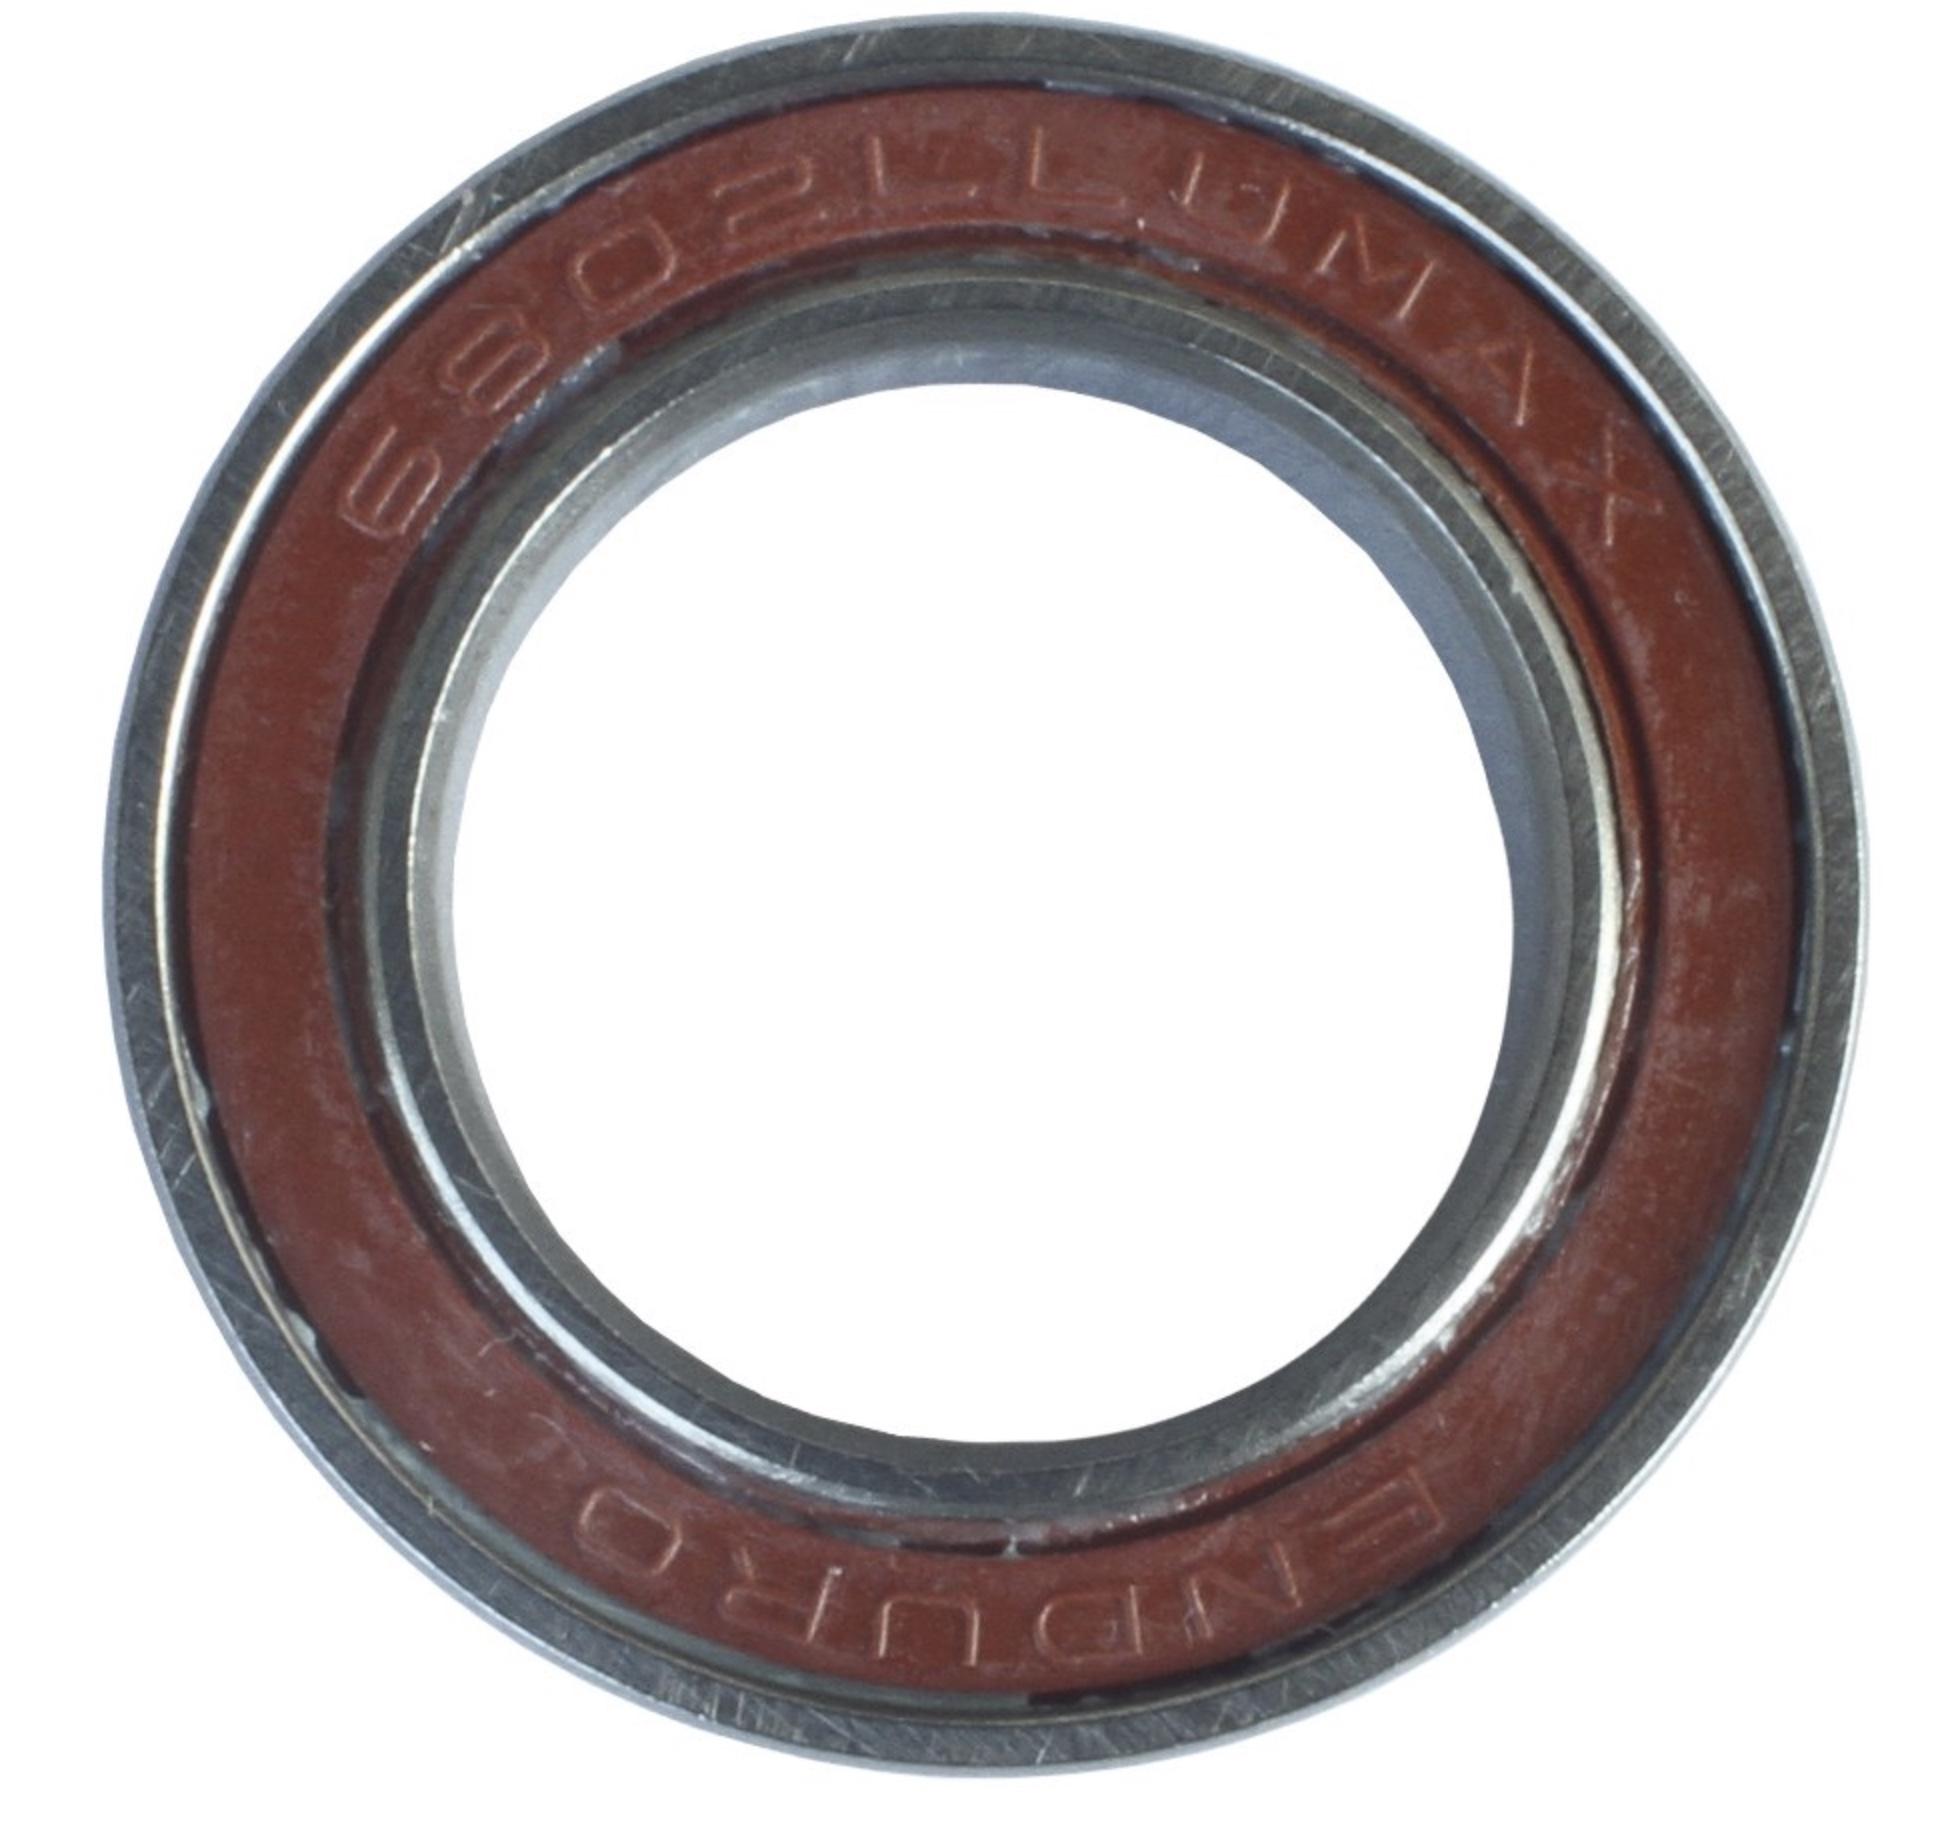 Kugleleje Enduro 6802-2RS ABEC3 LLU MAX (24x15x5 mm) - EB8028   Bottom brackets bearings